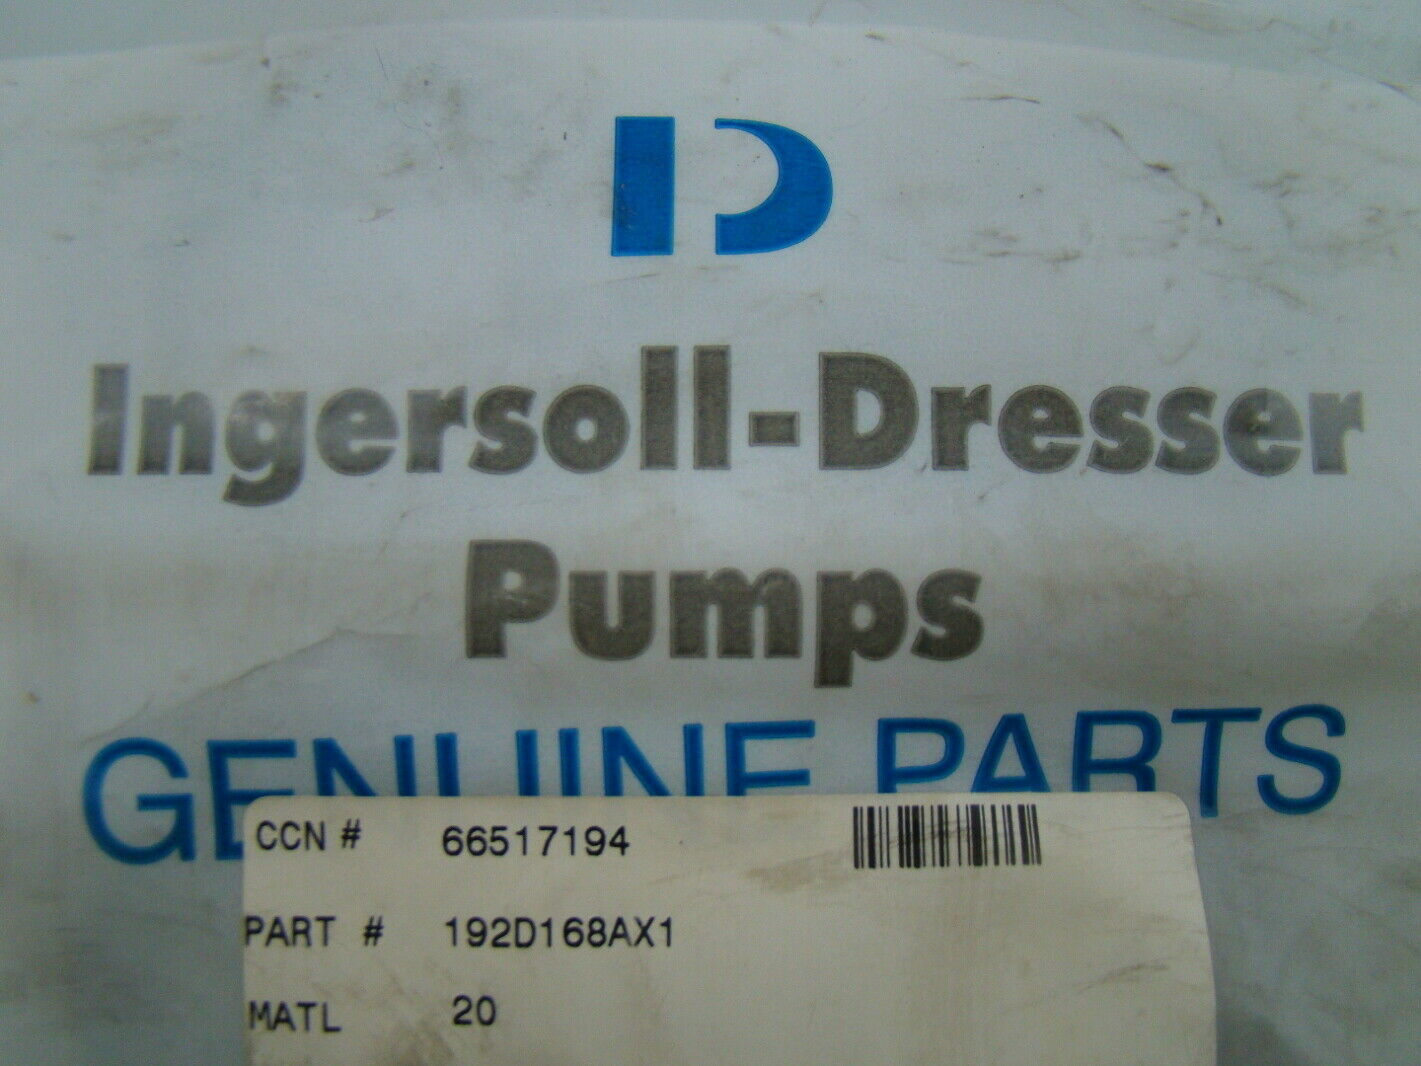 Ingersoll-Dresser Pumps 1 91